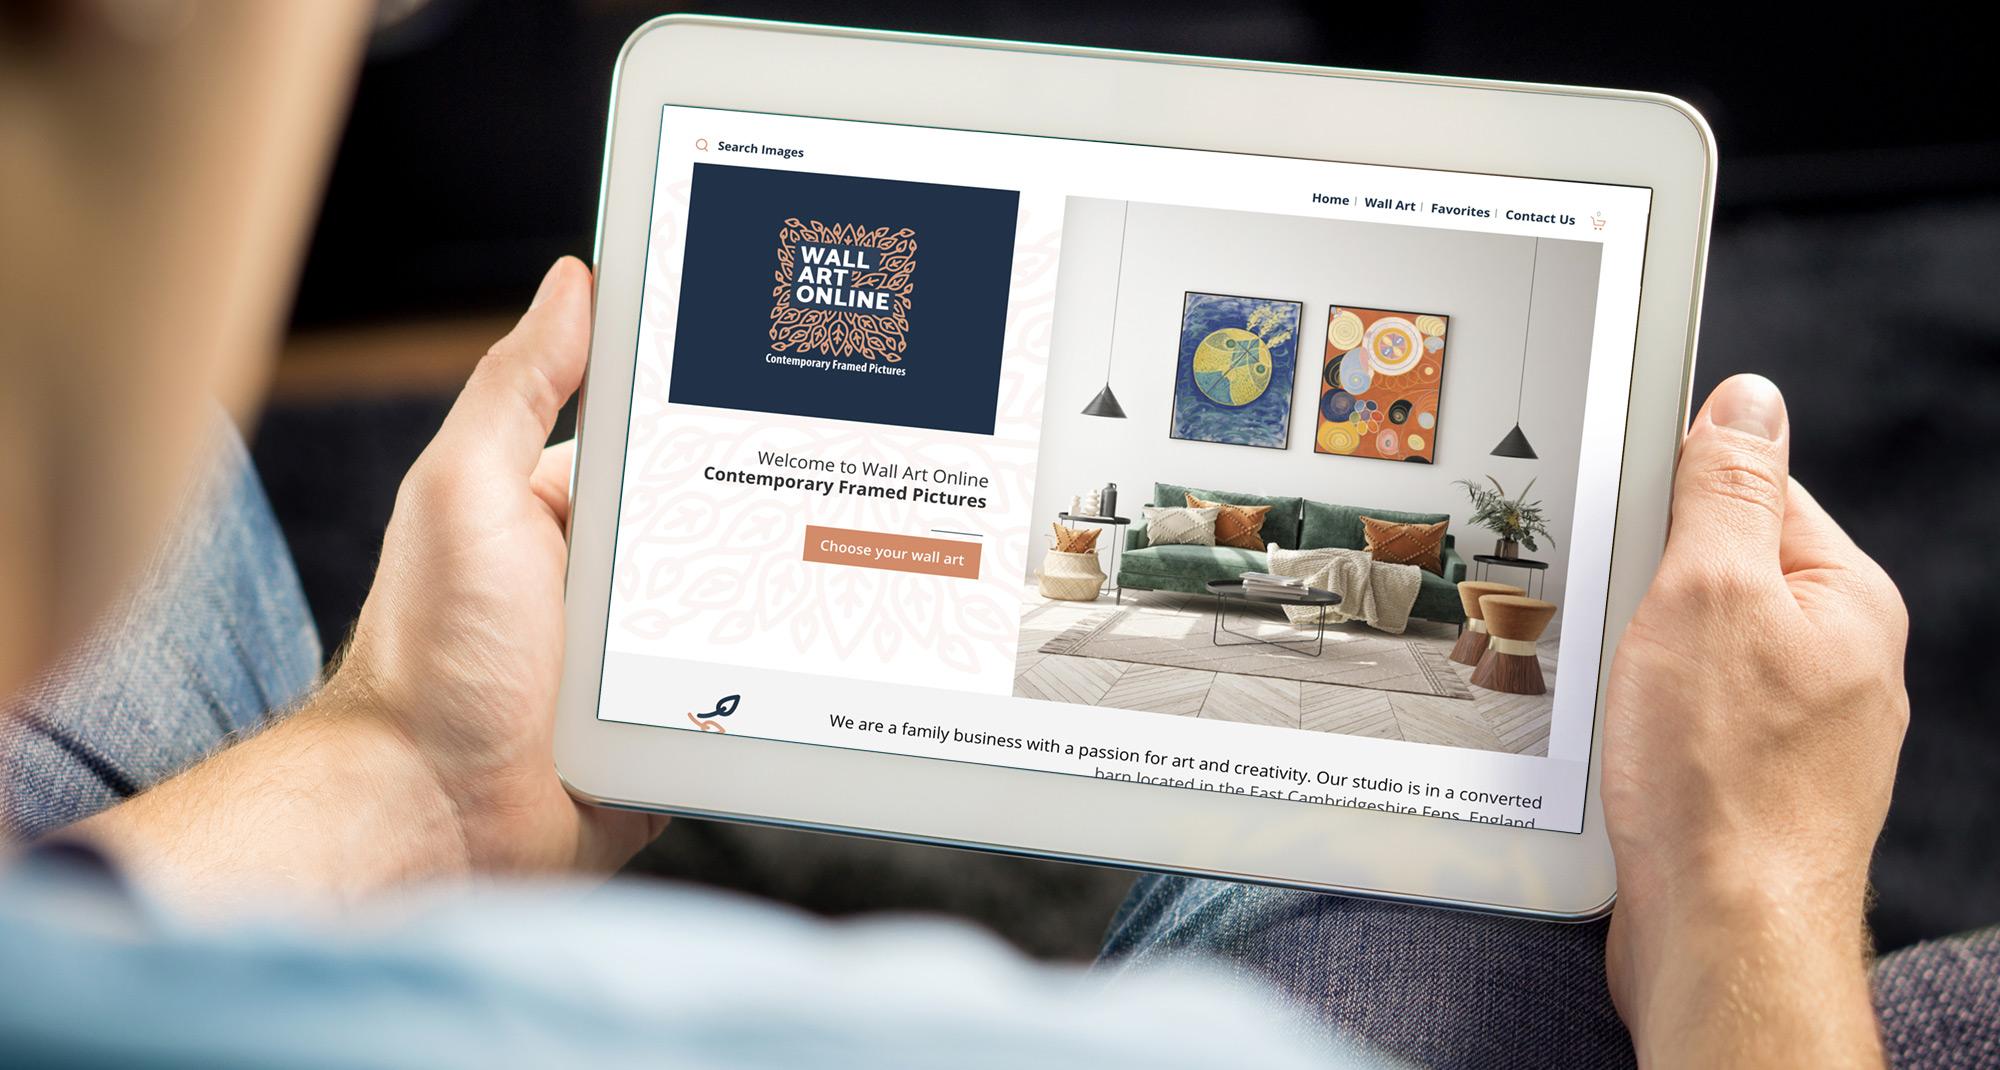 Wall Art Online website on a tablet